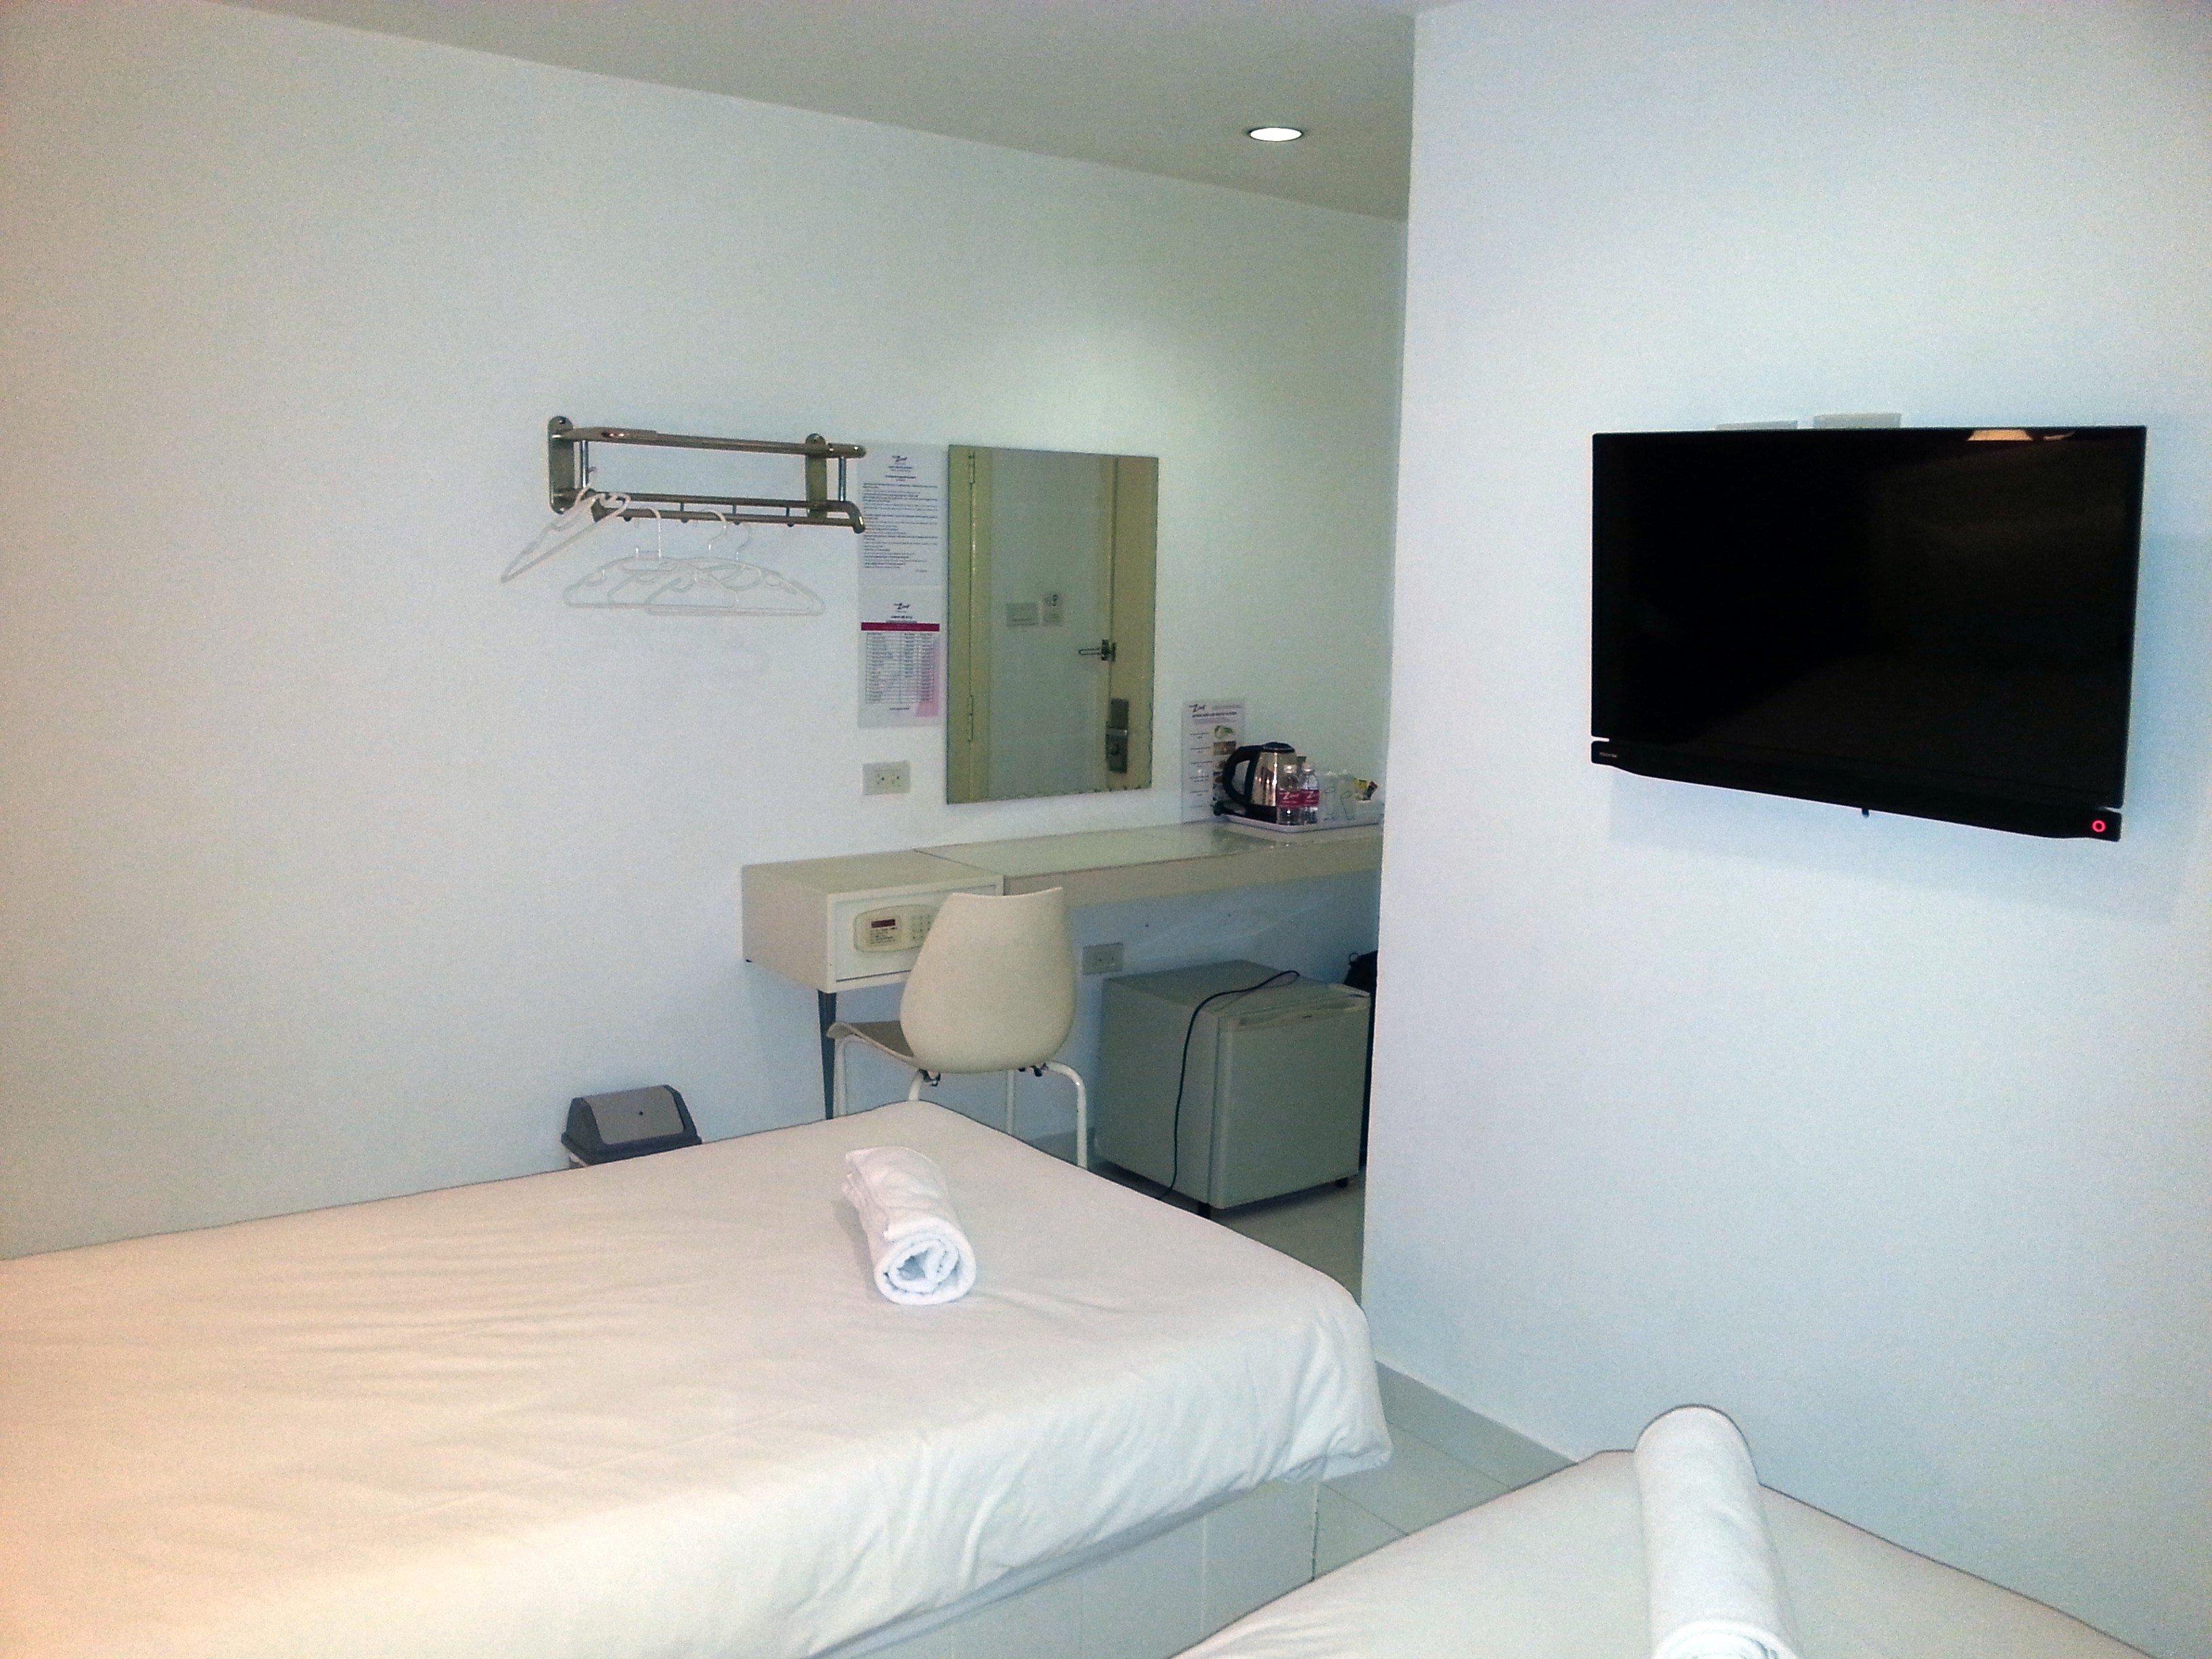 Room facilities at the Zing Hotel